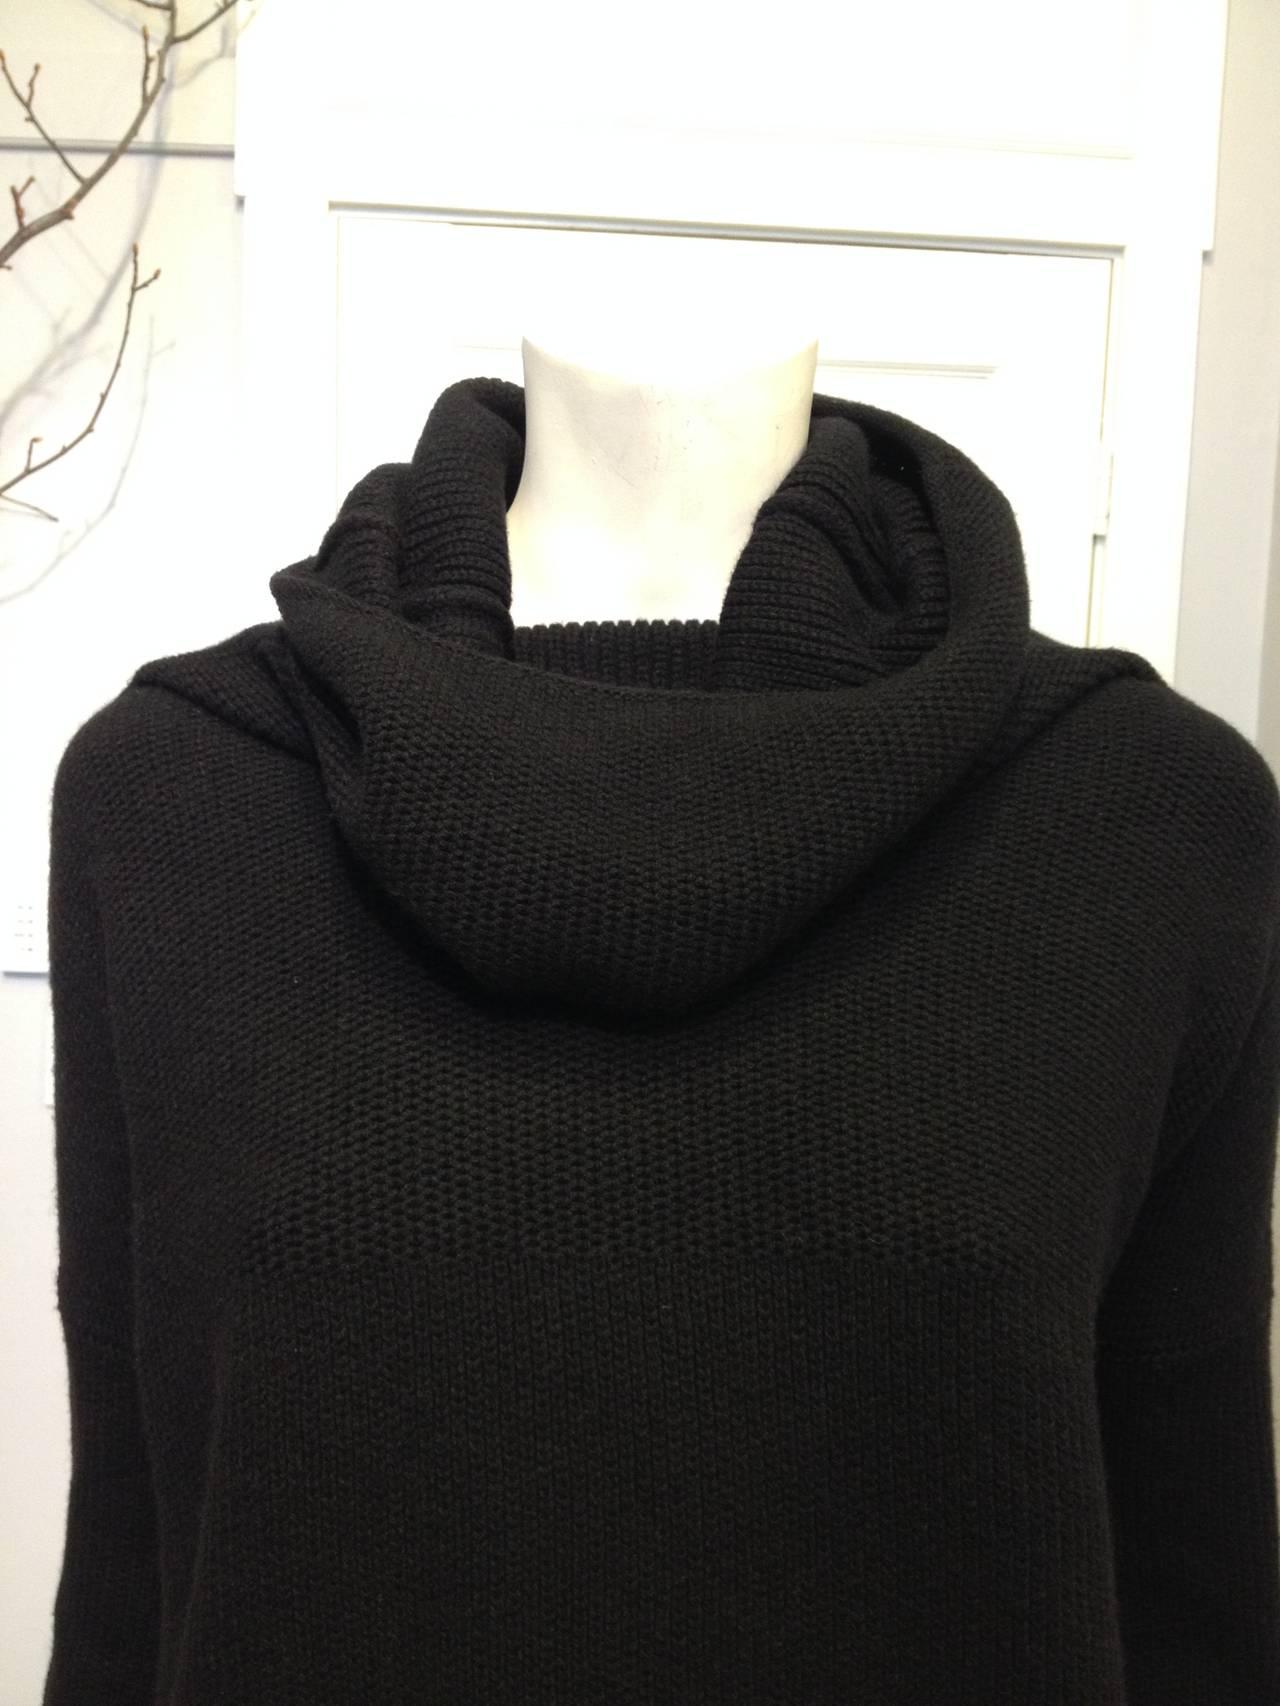 Hermes Black Turtleneck Sweater 3